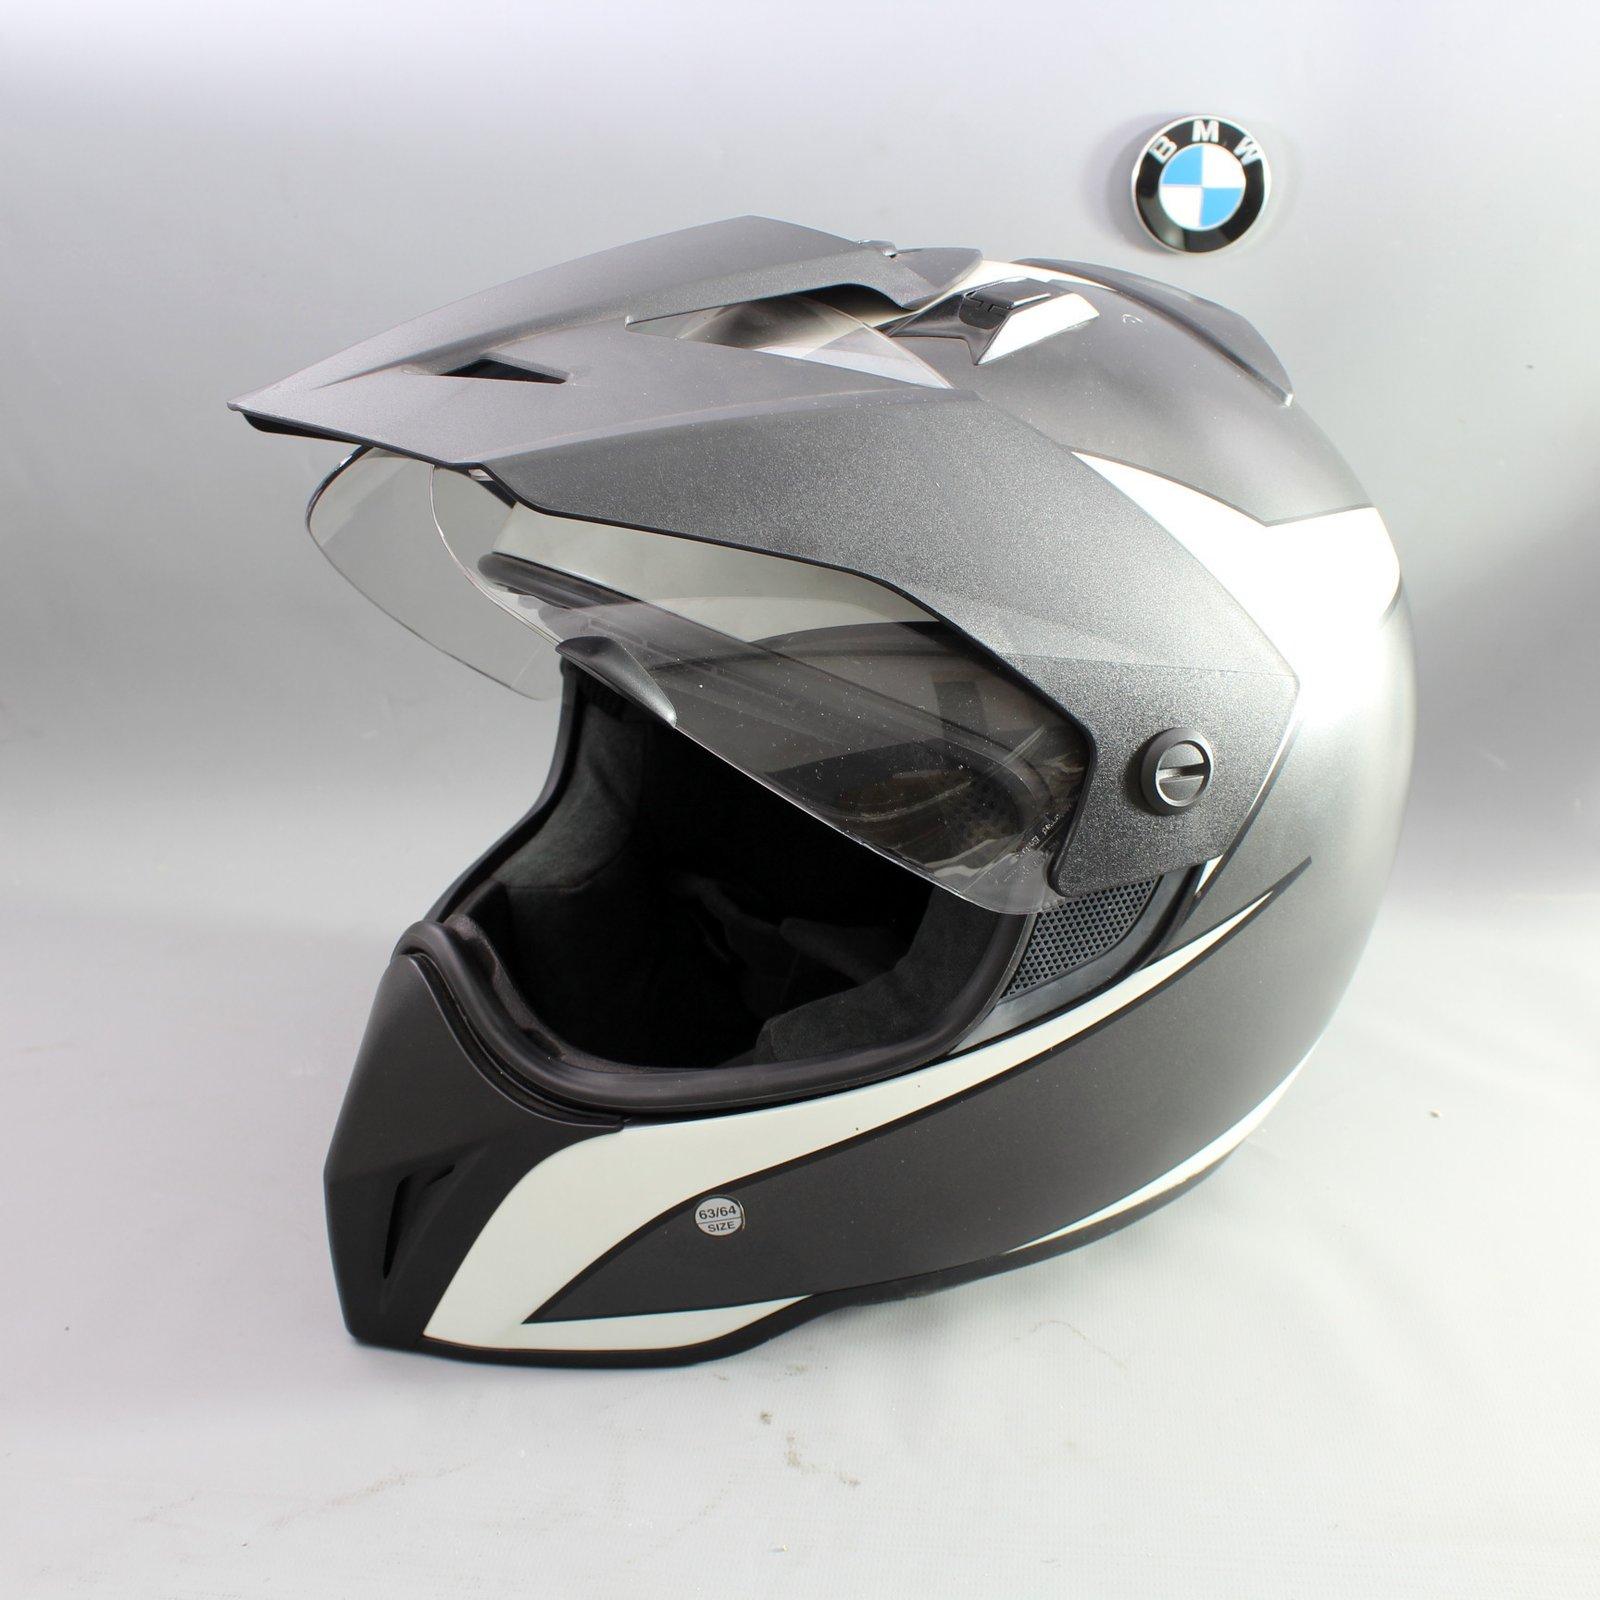 original bmw enduro helm volt schwarz motorradhelm gr 63. Black Bedroom Furniture Sets. Home Design Ideas